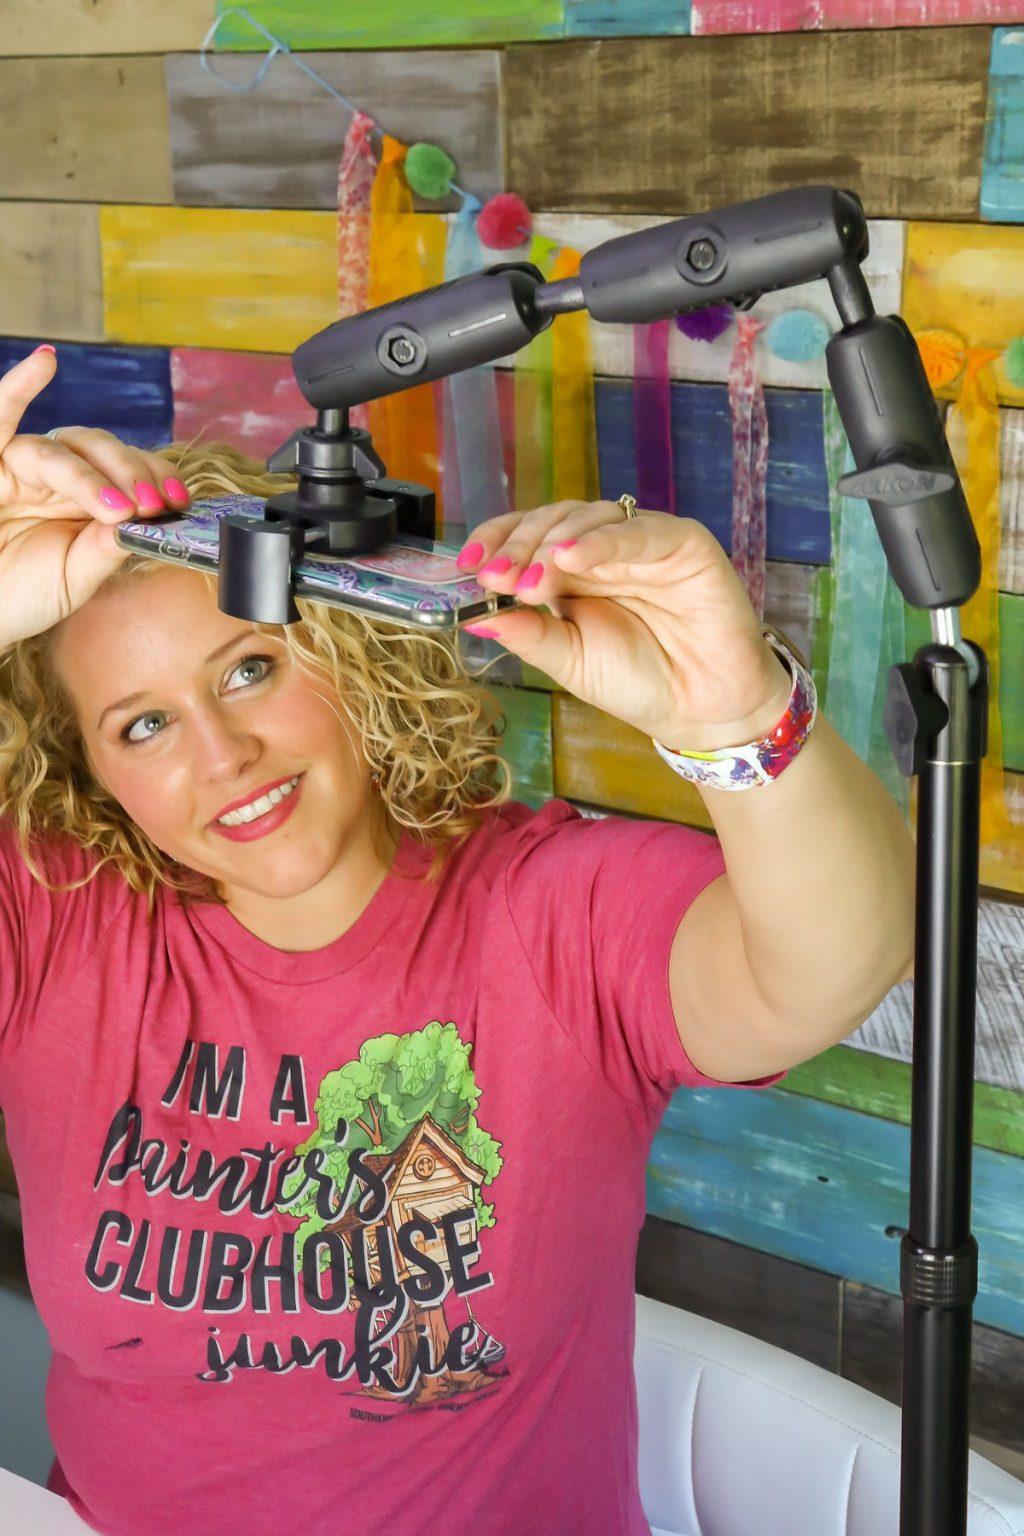 Gift Guide Door Hanger Business Owner Tamara Bennett using an Arkon Mount for her Facebook Live Videos